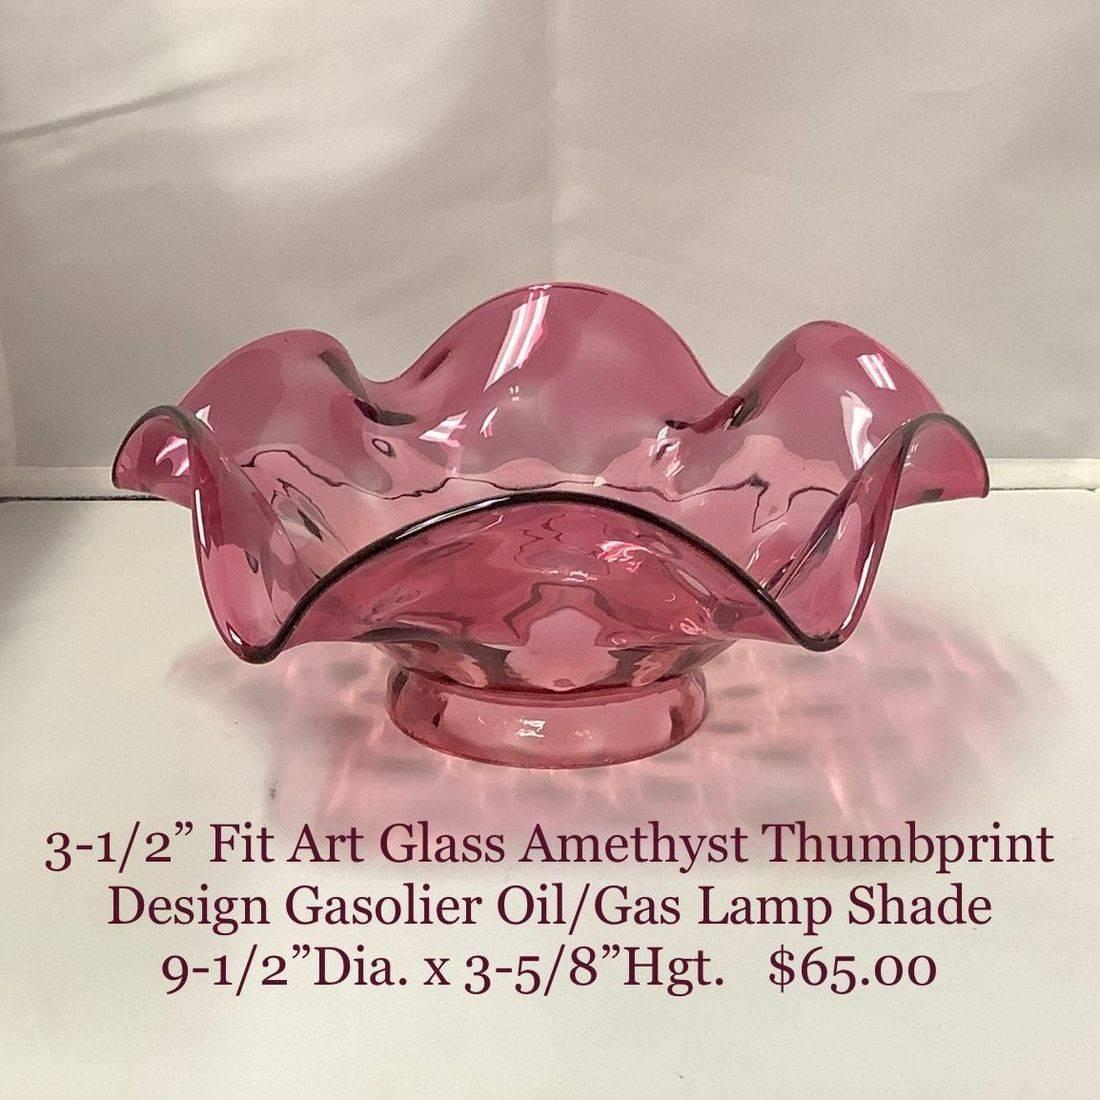 "3-1/2"" Fit Art Glass Amethyst Thumbprint Design Oil/Gas Lamp Shade   $65.00"